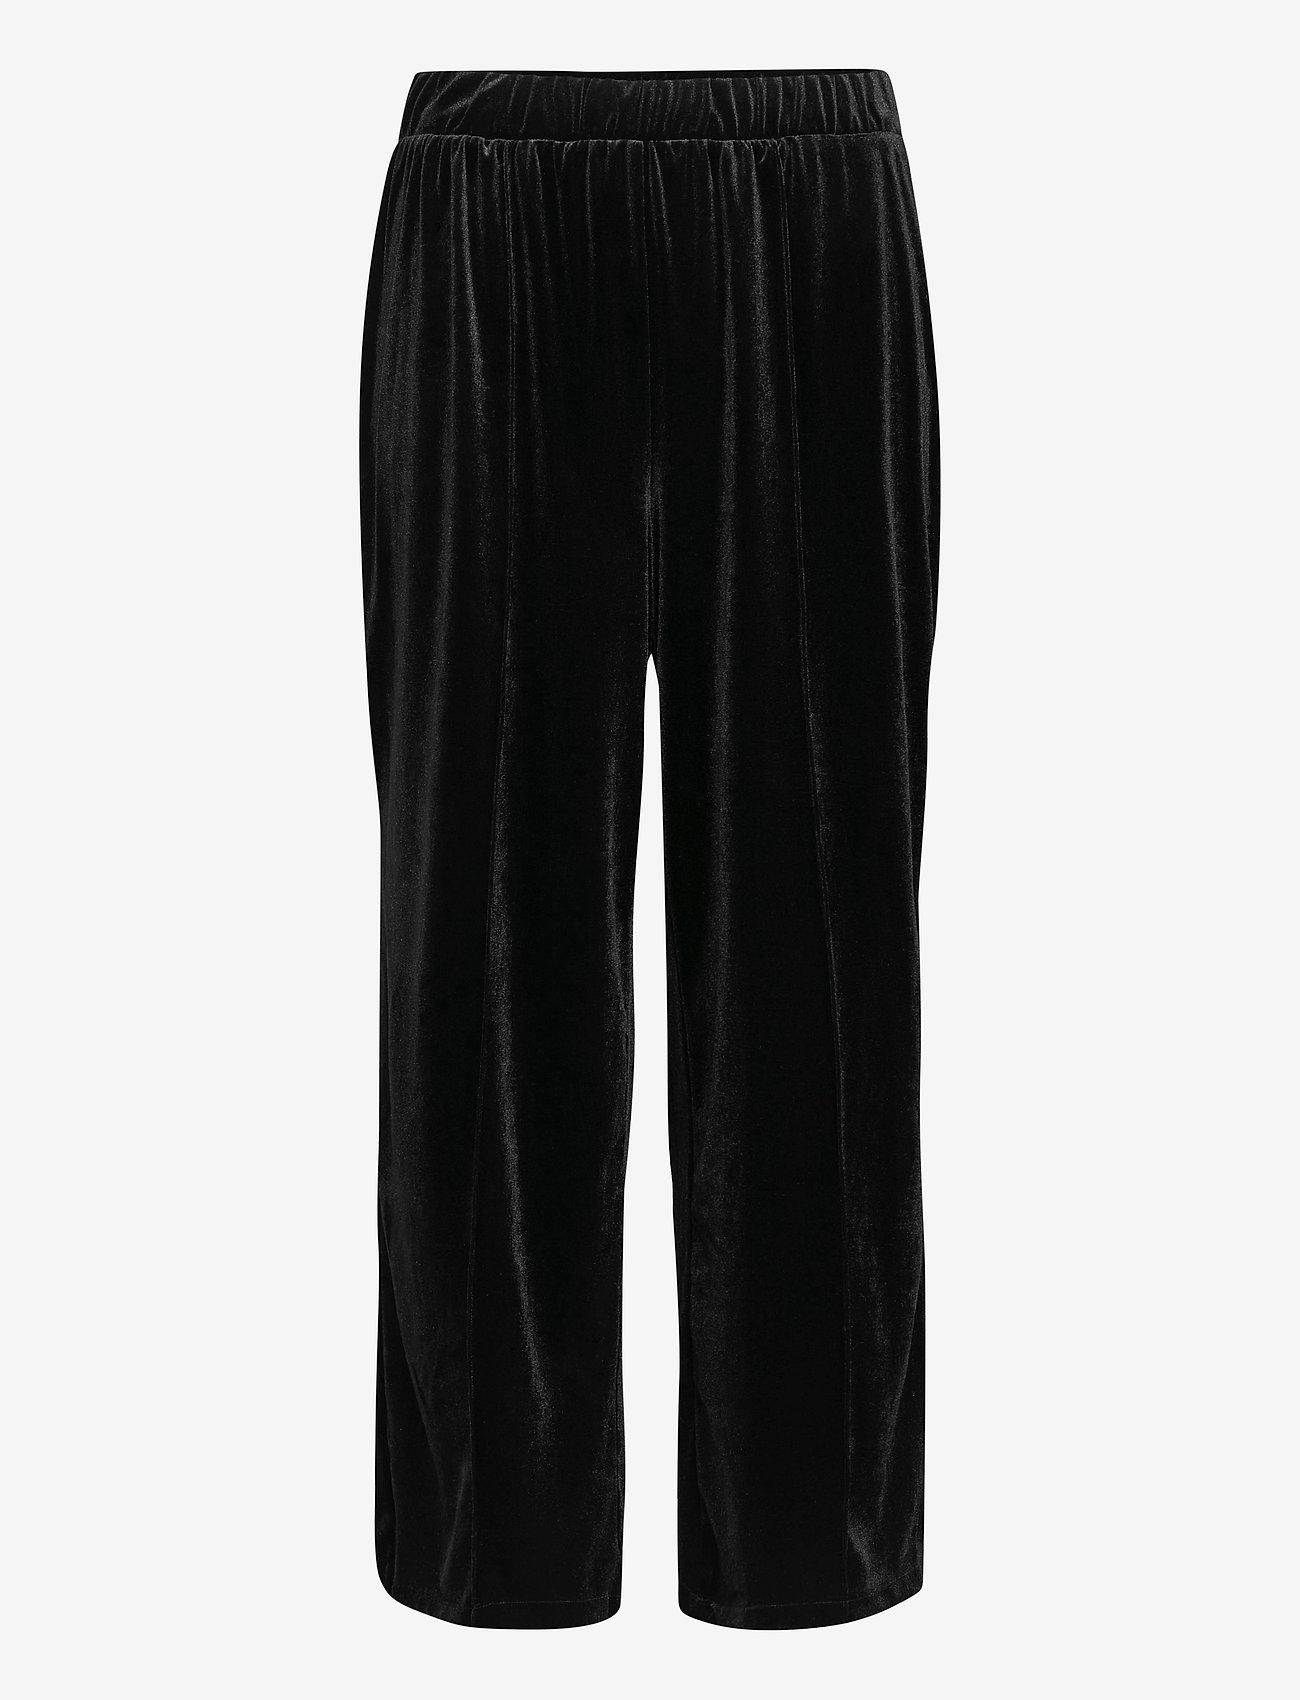 Zizzi - Pants Velvet Plus Size Loose Fit Elastic Waistband - shorts casual - black - 0